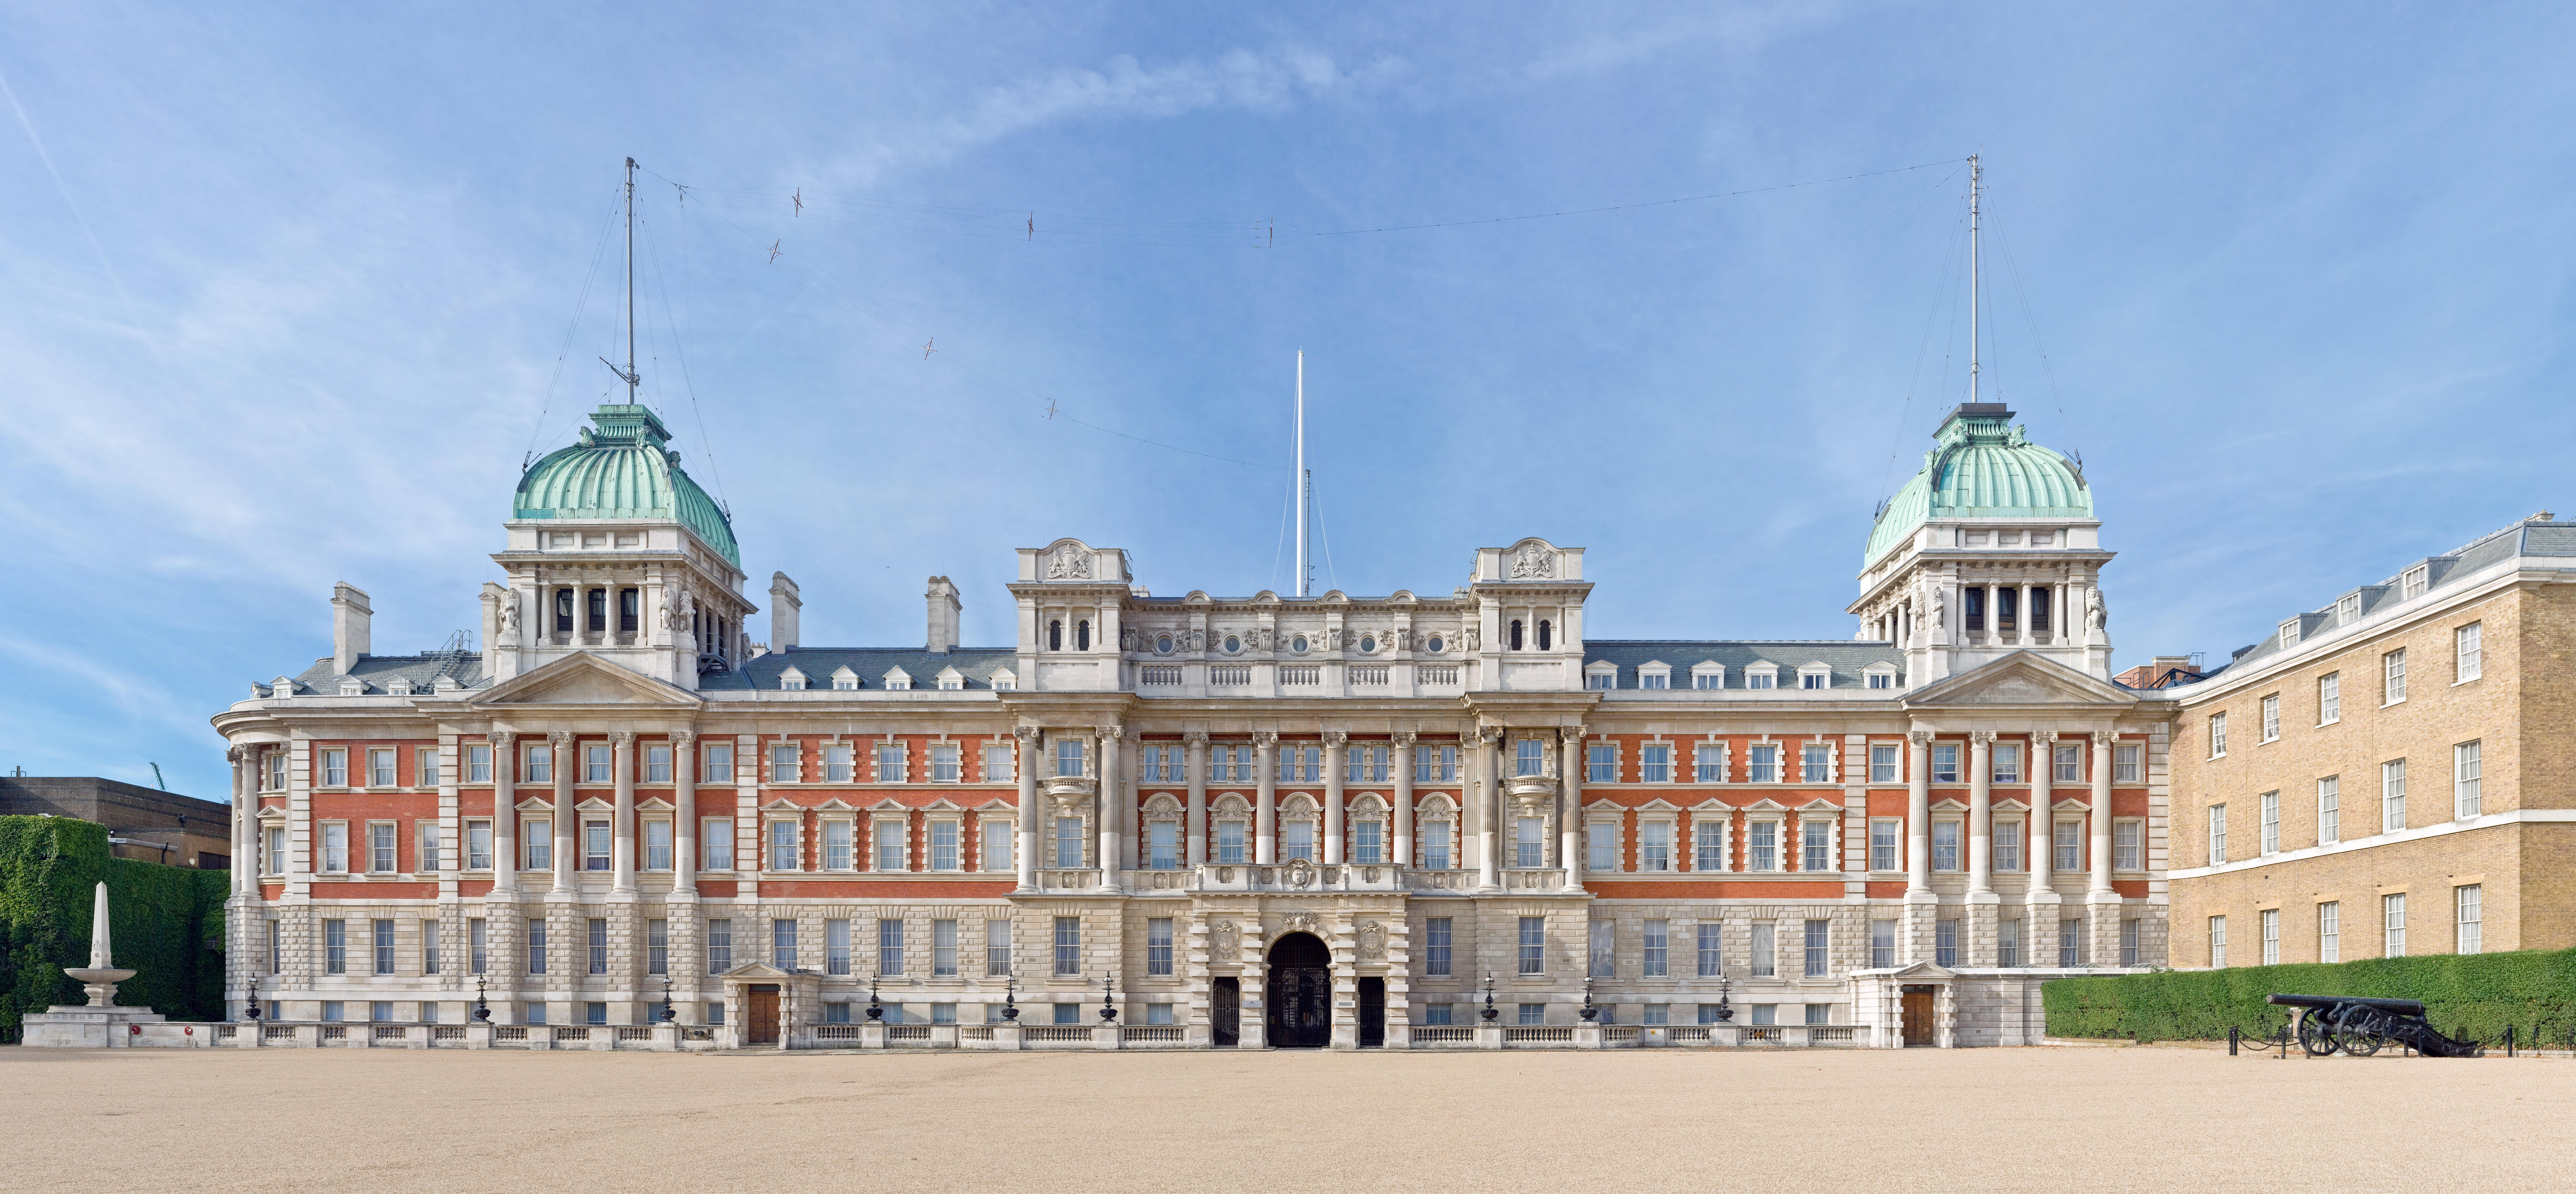 Landmark Hotel London England